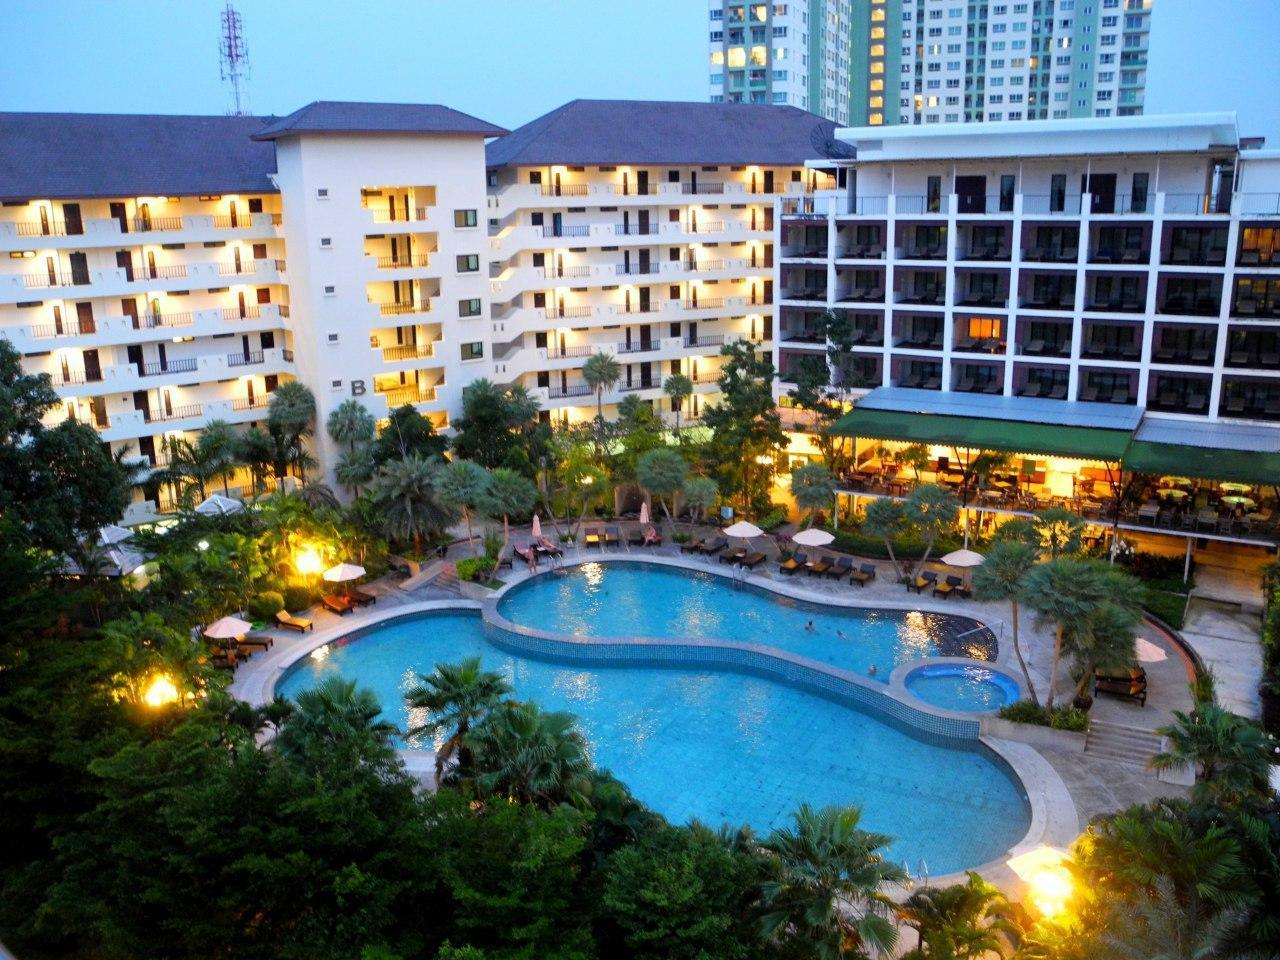 Wongamat  2 bedroom อพาร์ตเมนต์ 2 ห้องนอน 2 ห้องน้ำส่วนตัว ขนาด 85 ตร.ม. – บางละมุง